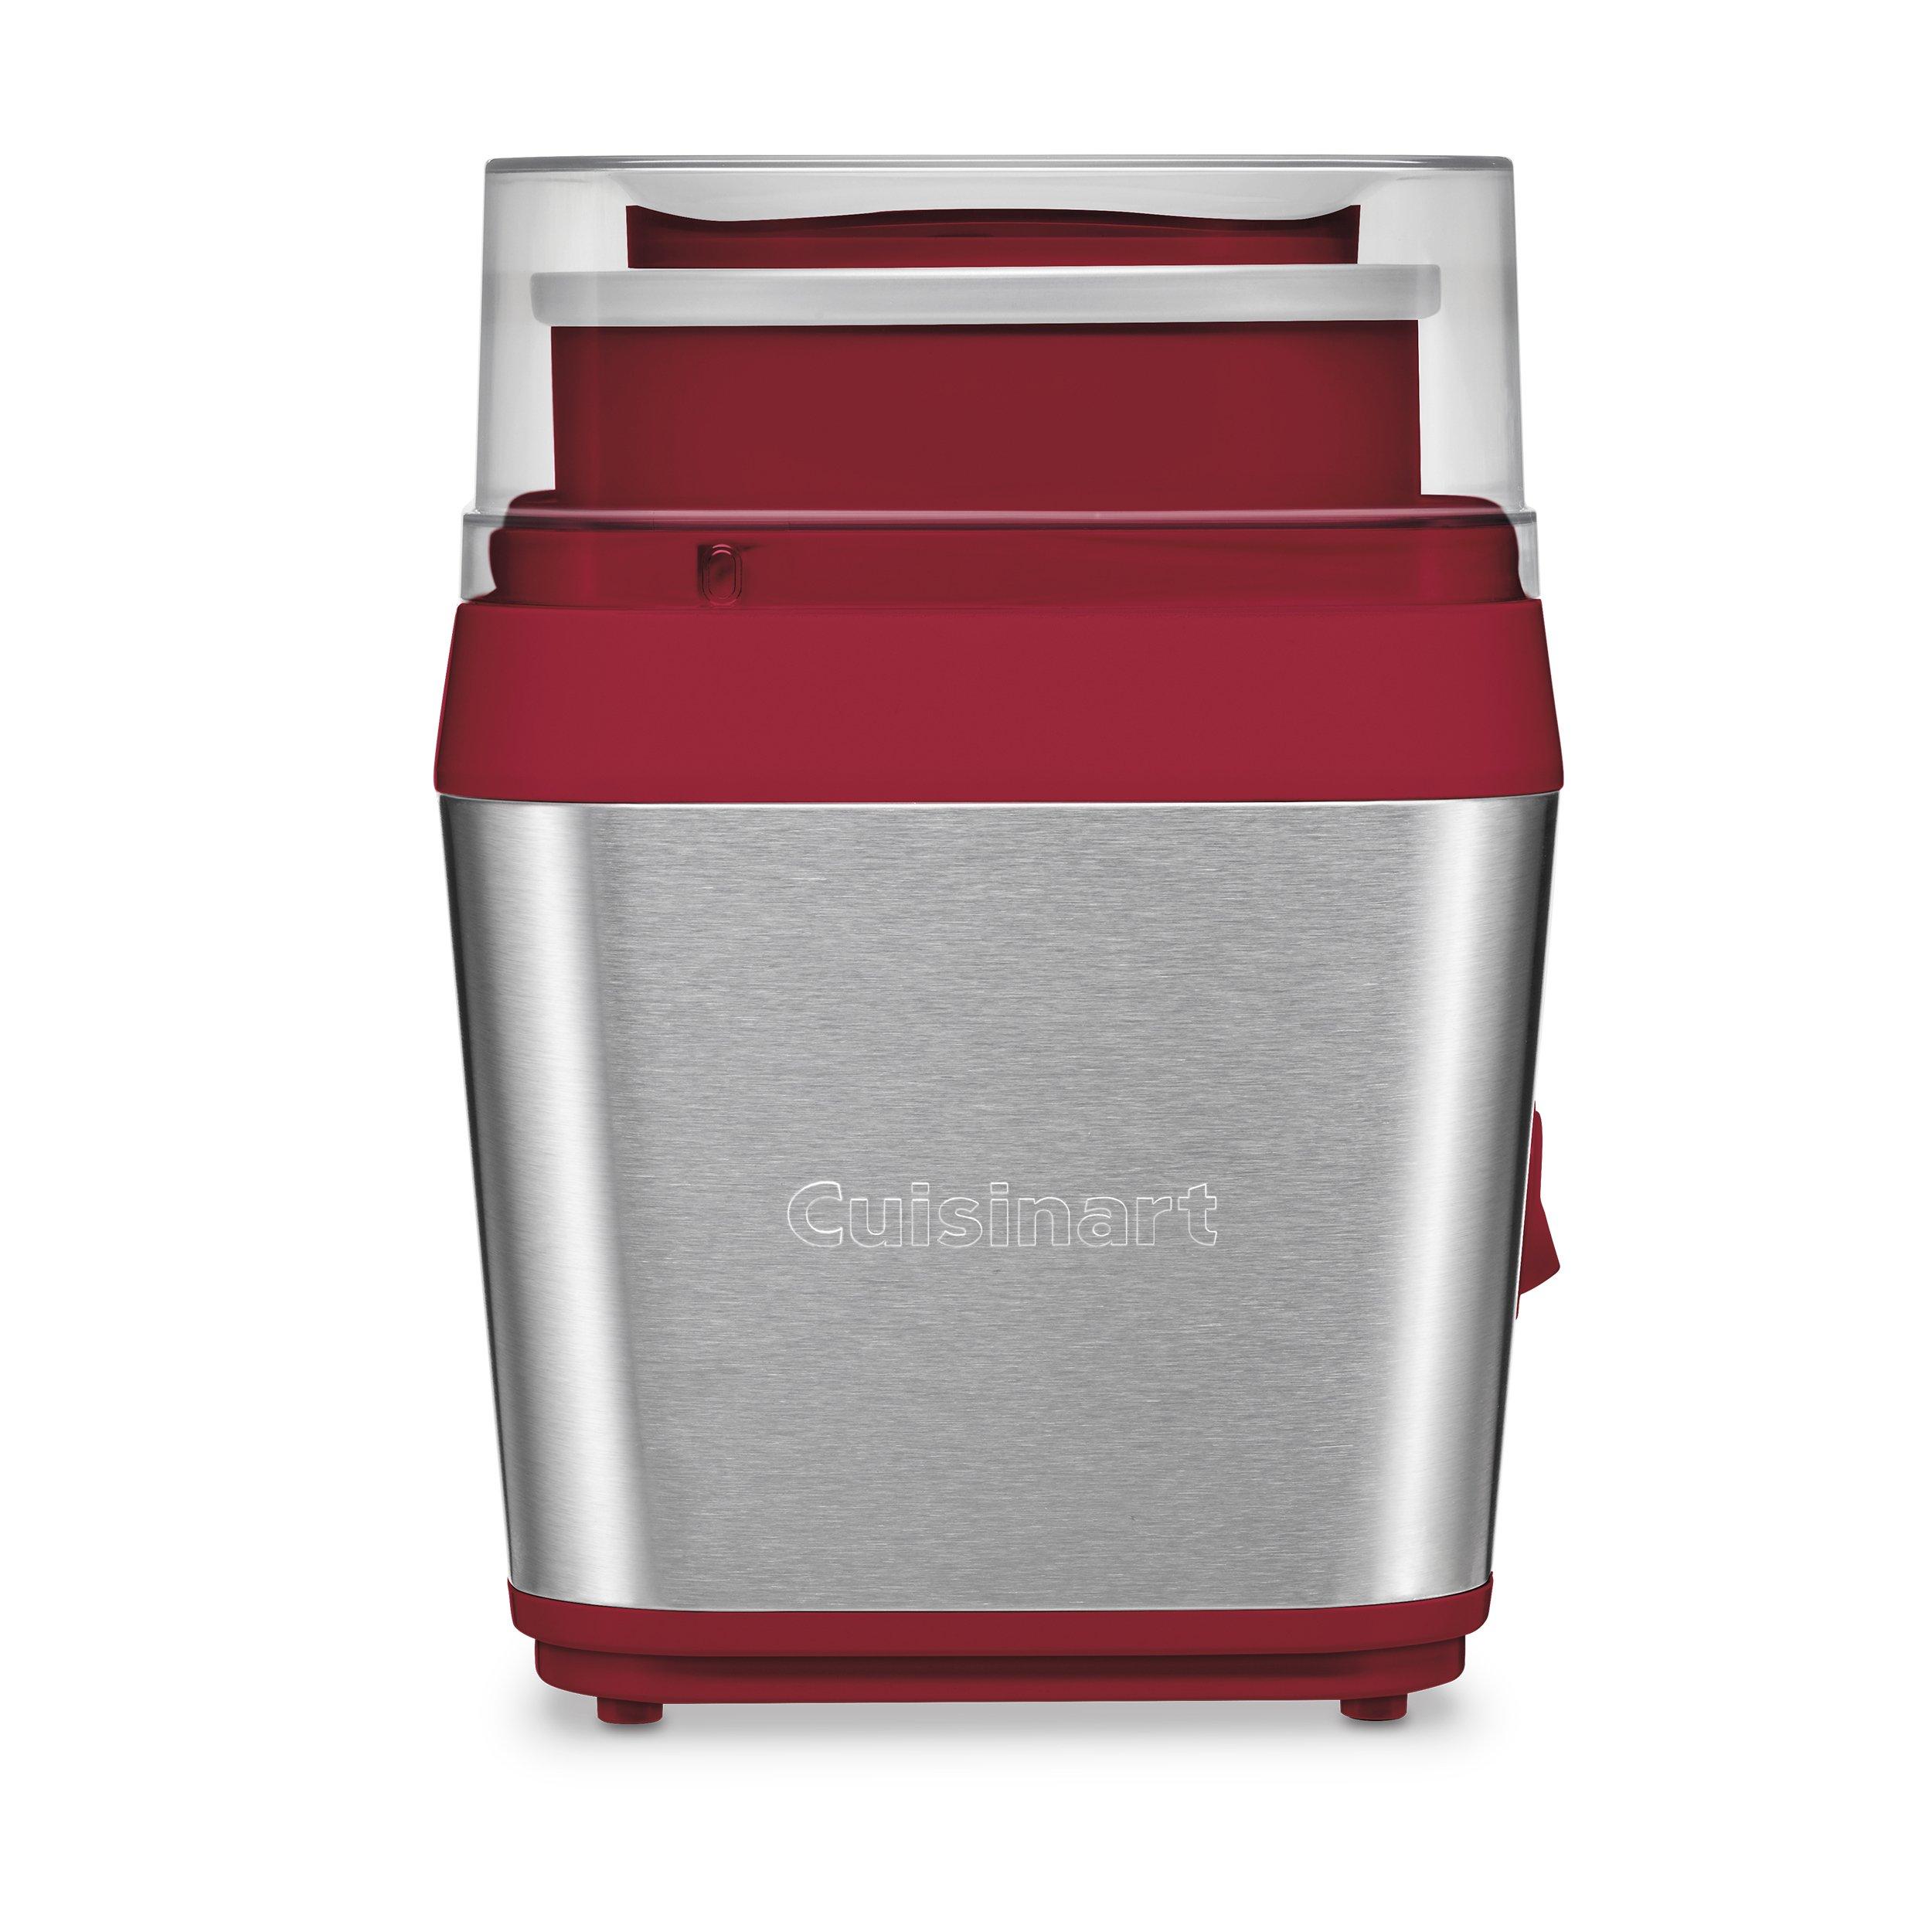 Cuisinart ICE-31R Ice Cream Maker, Red